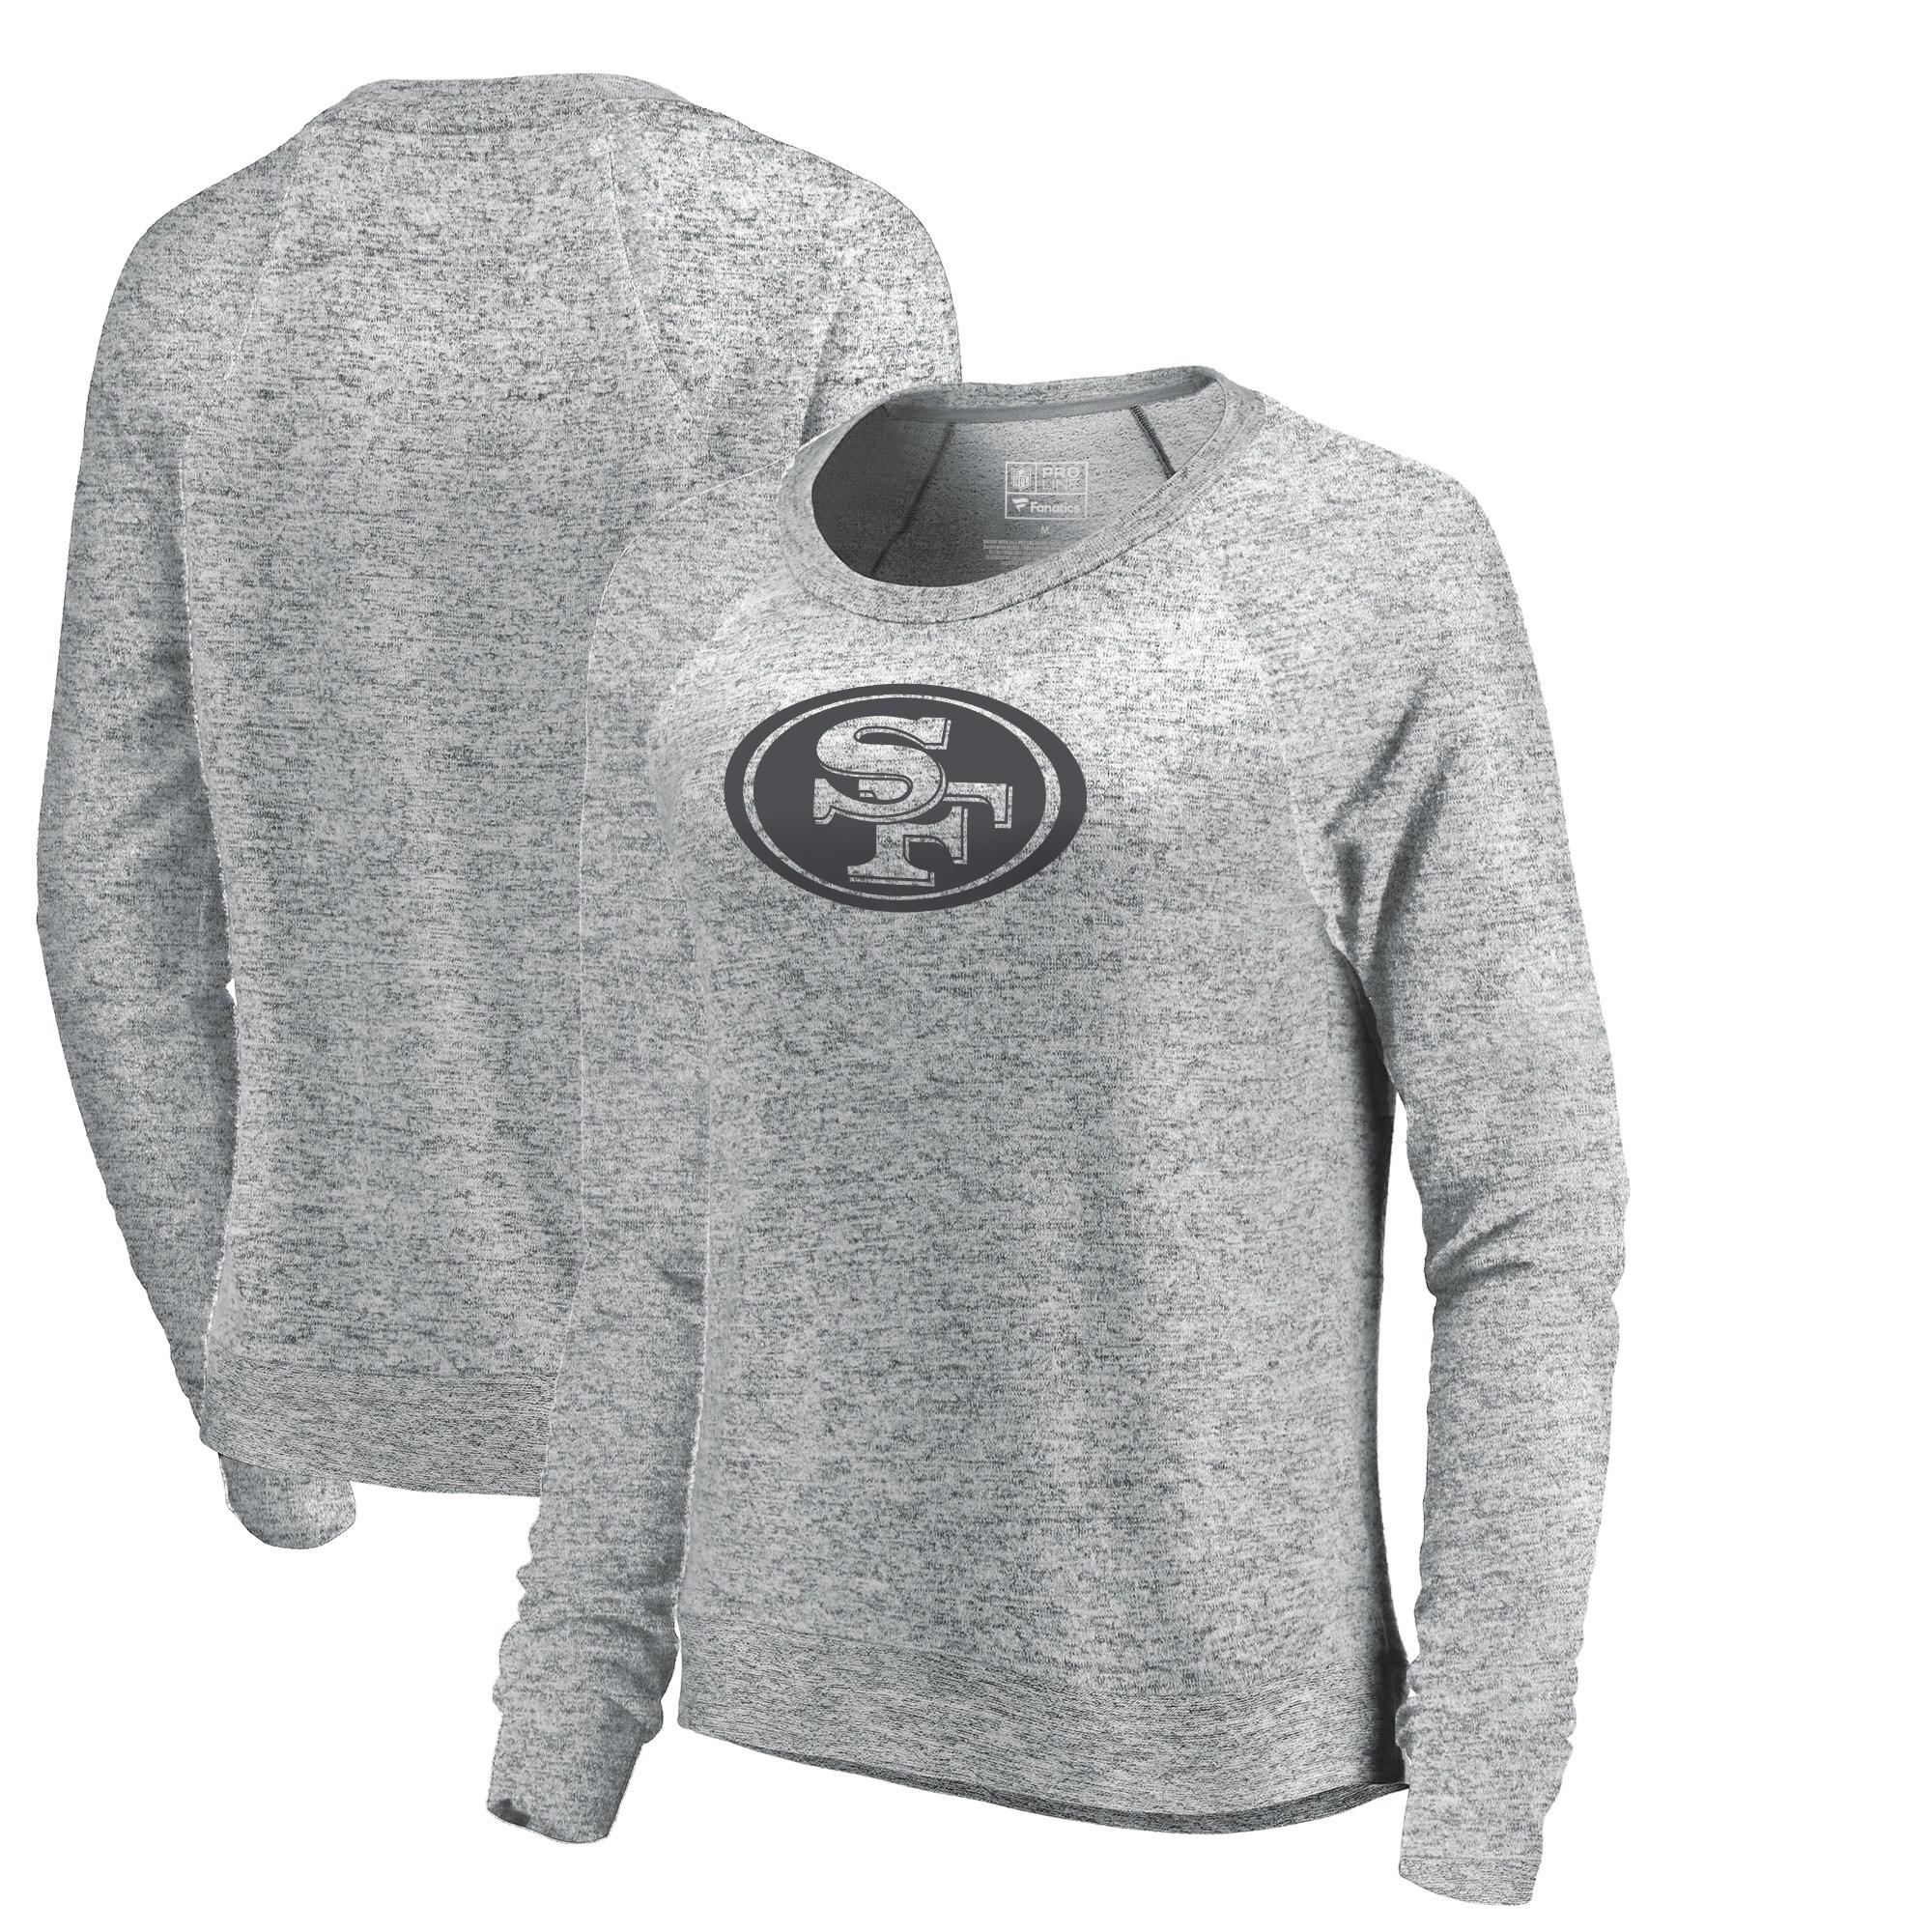 San Francisco 49ers NFL Pro Line by Fanatics Branded Women's Cozy Collection Plush Crew Sweatshirt - Ash